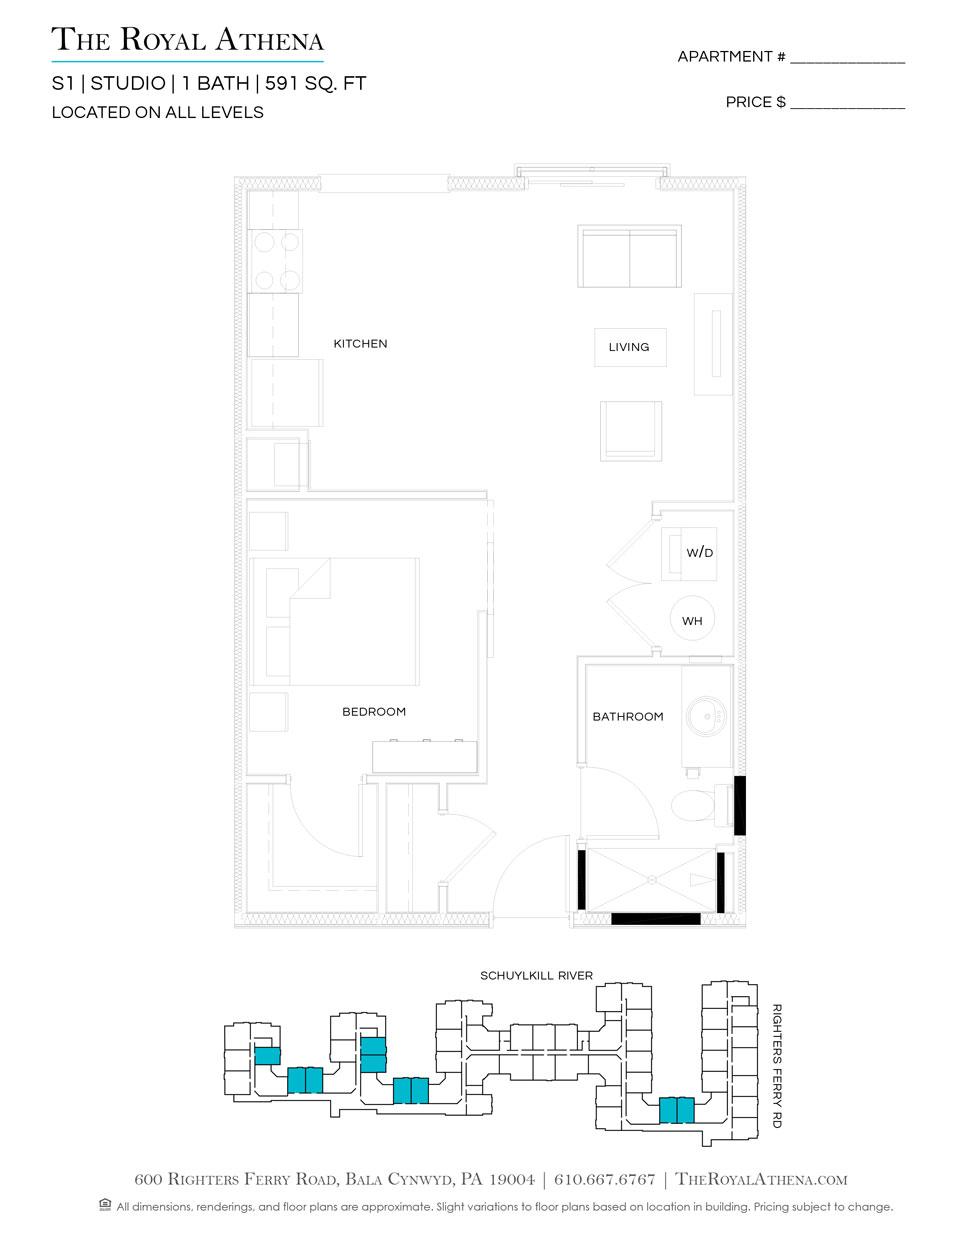 P0659218 s1 2 floorplan